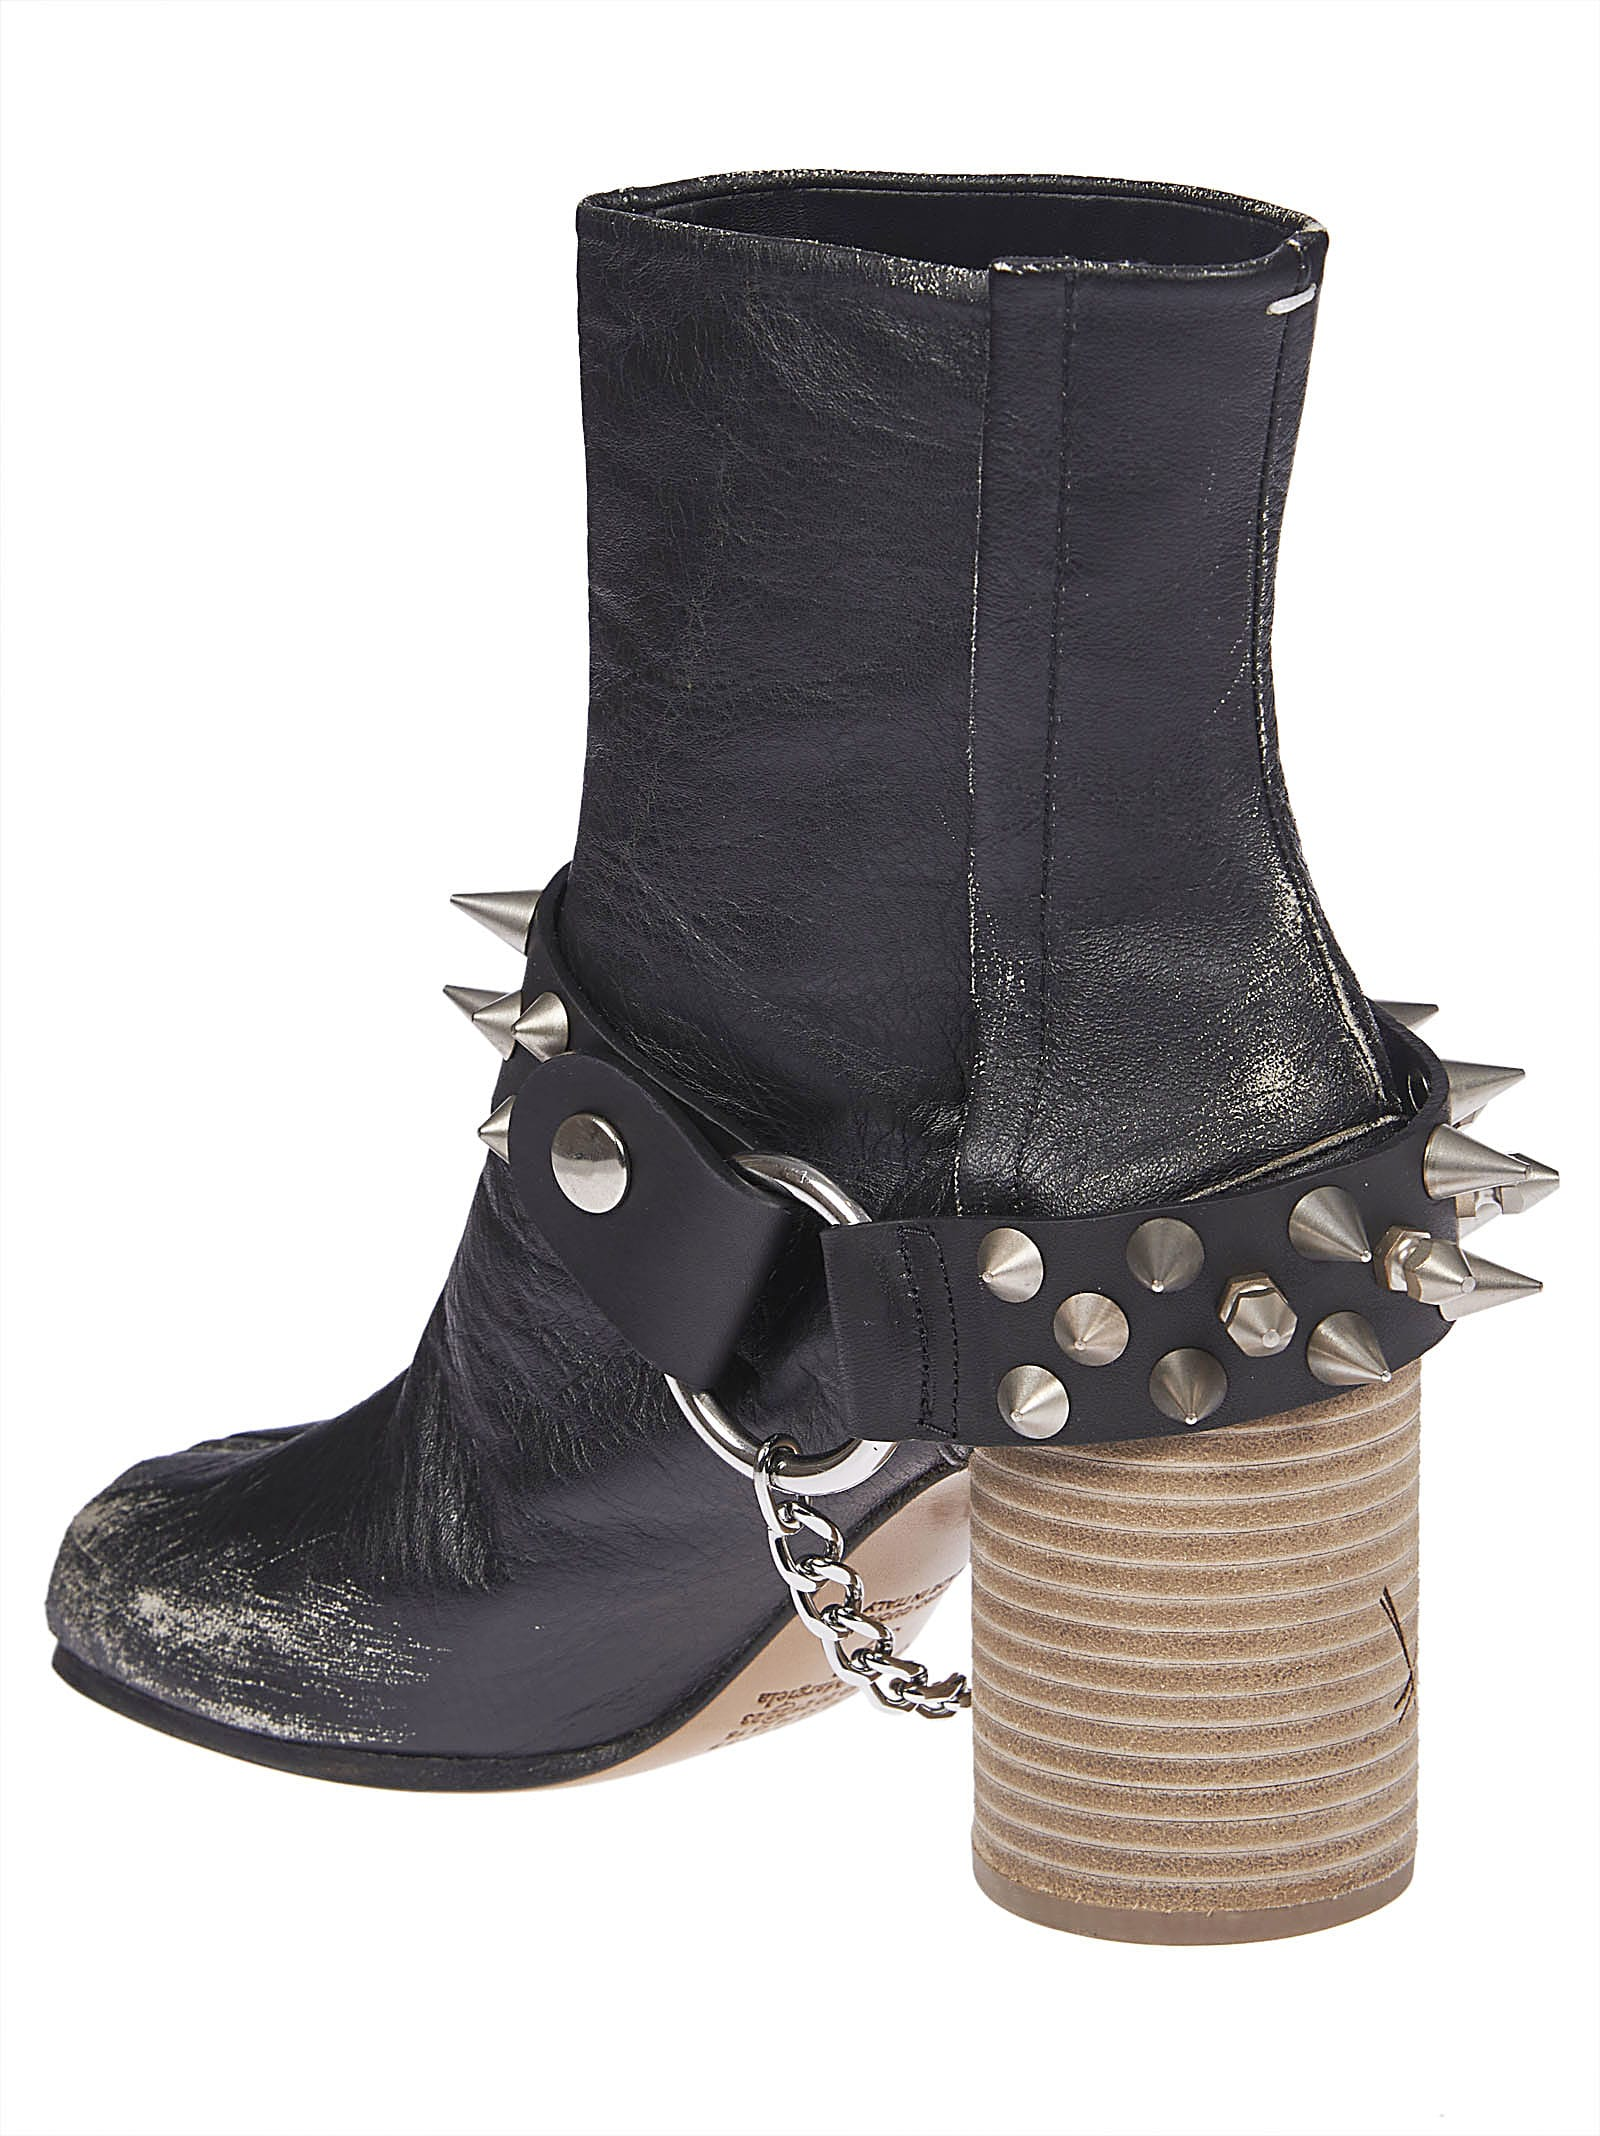 Maison Margiela Boots   italist, ALWAYS